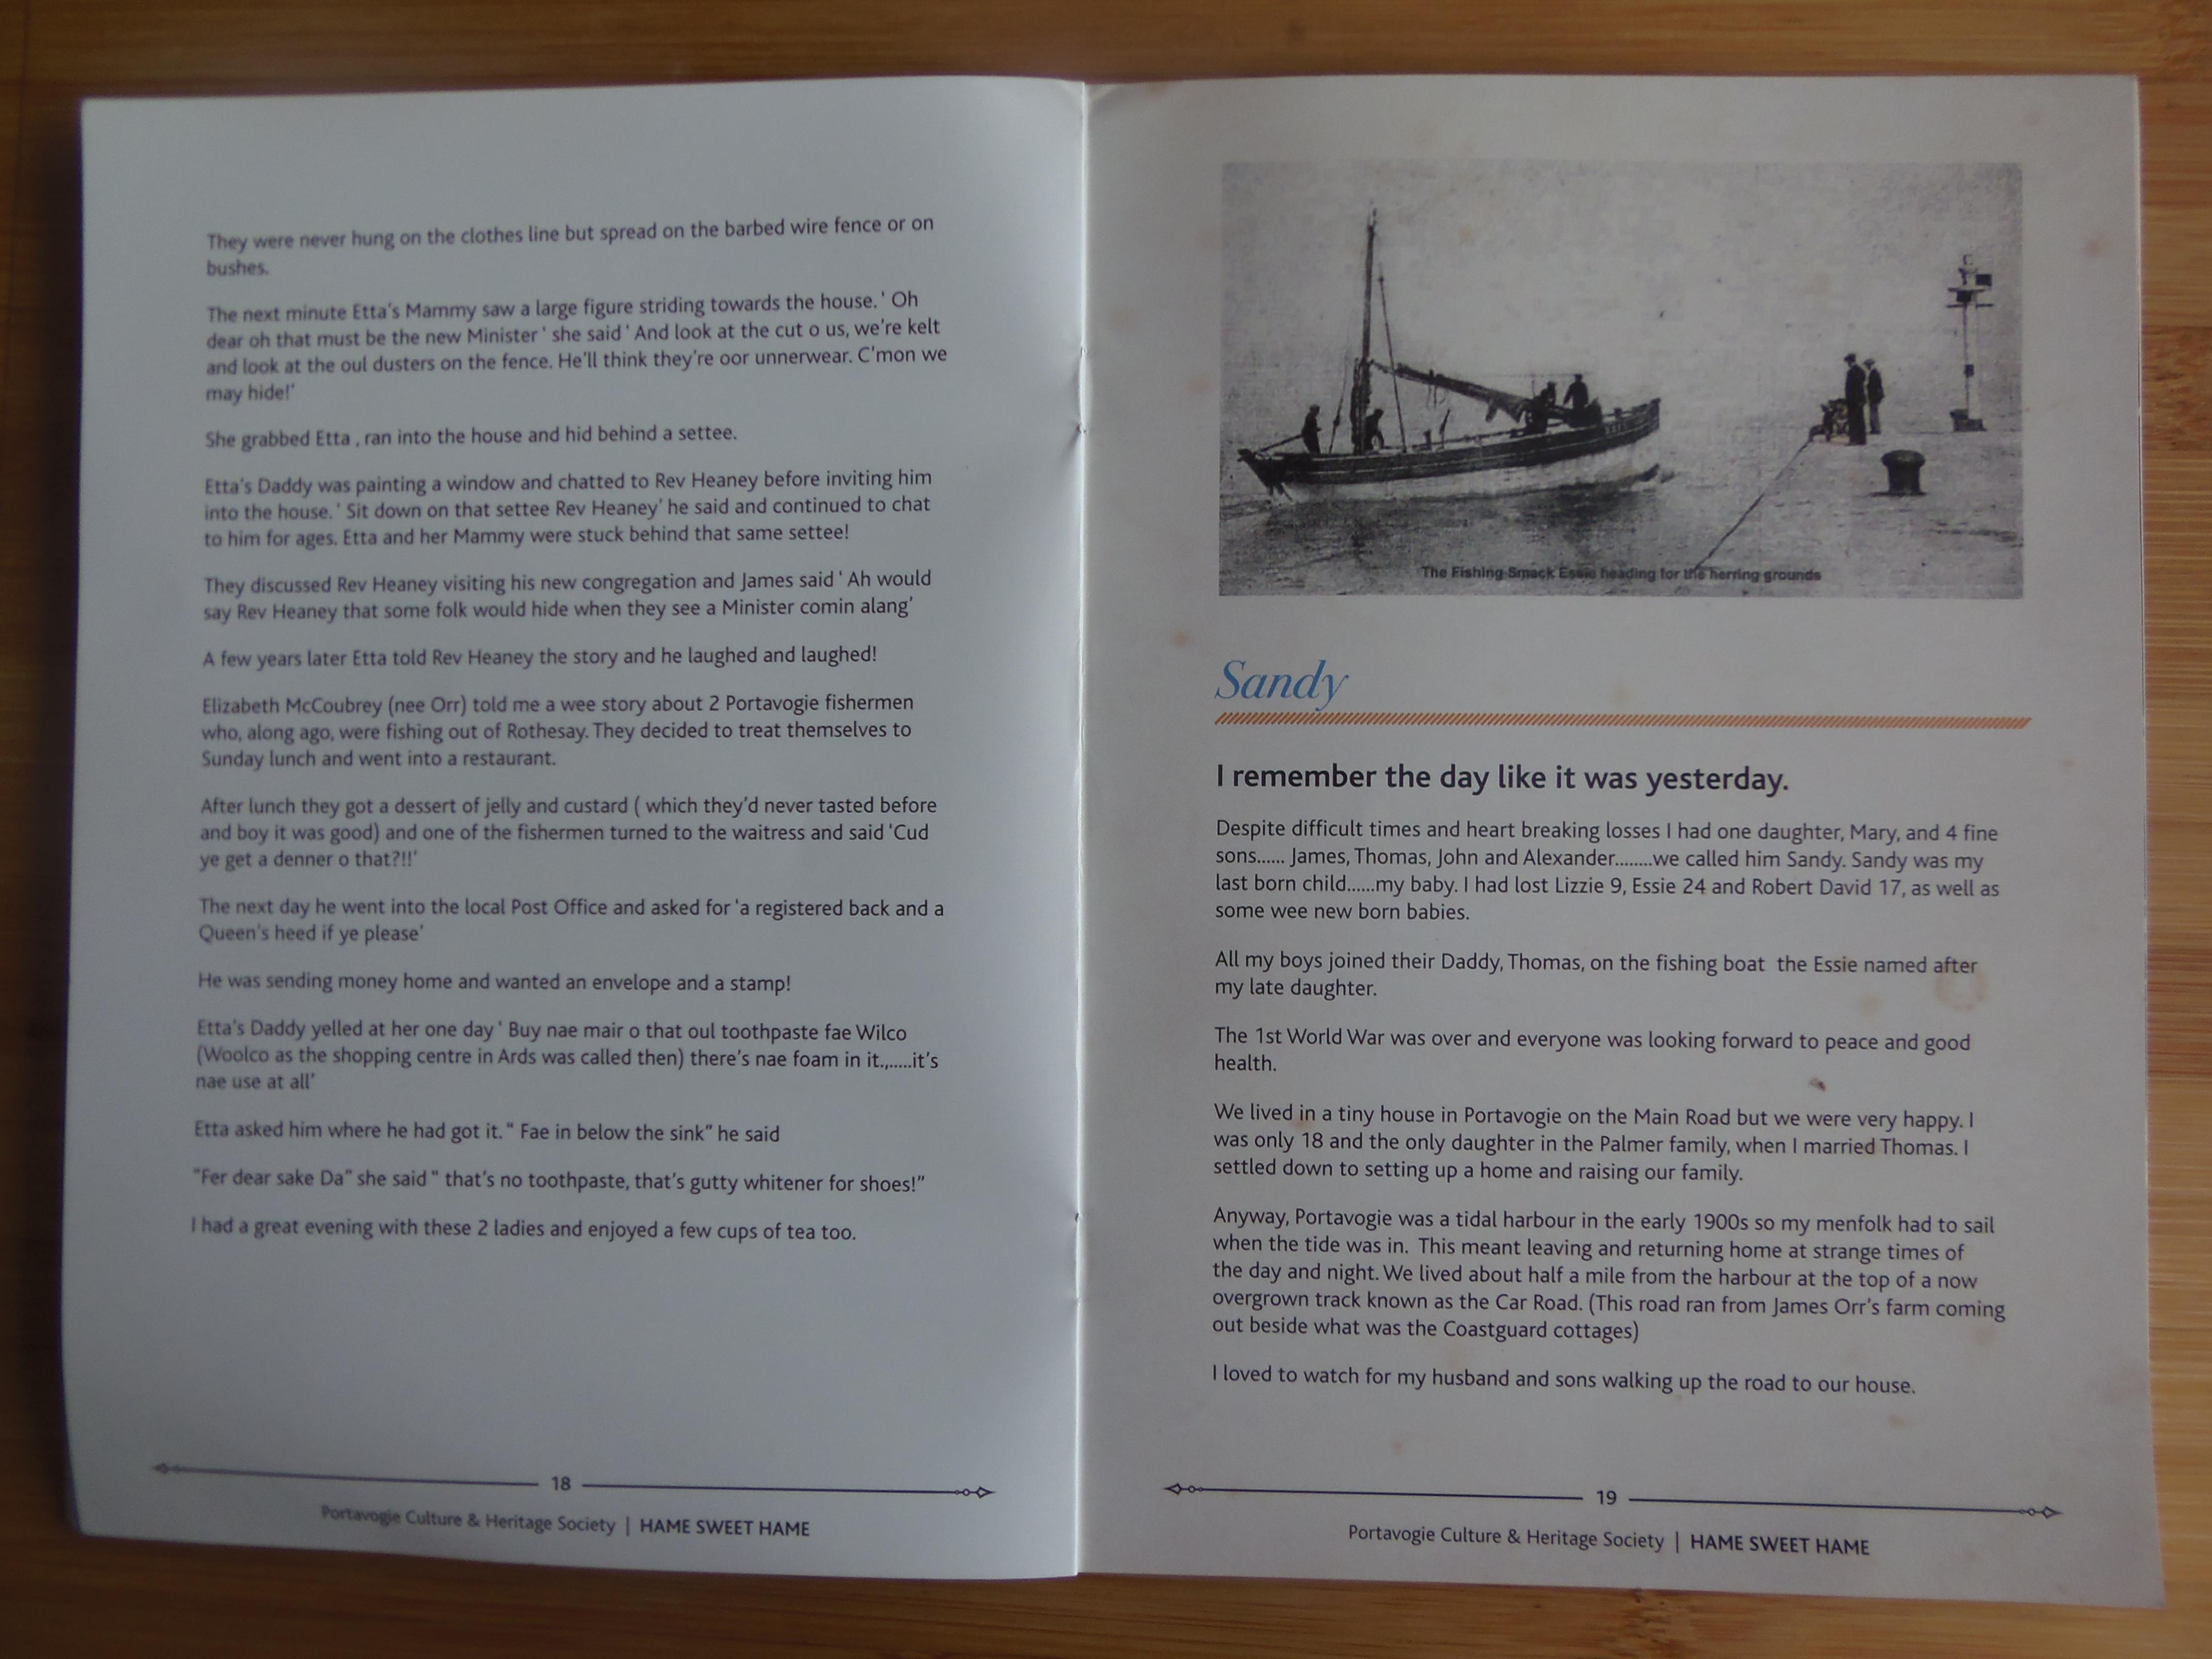 pg 18-19